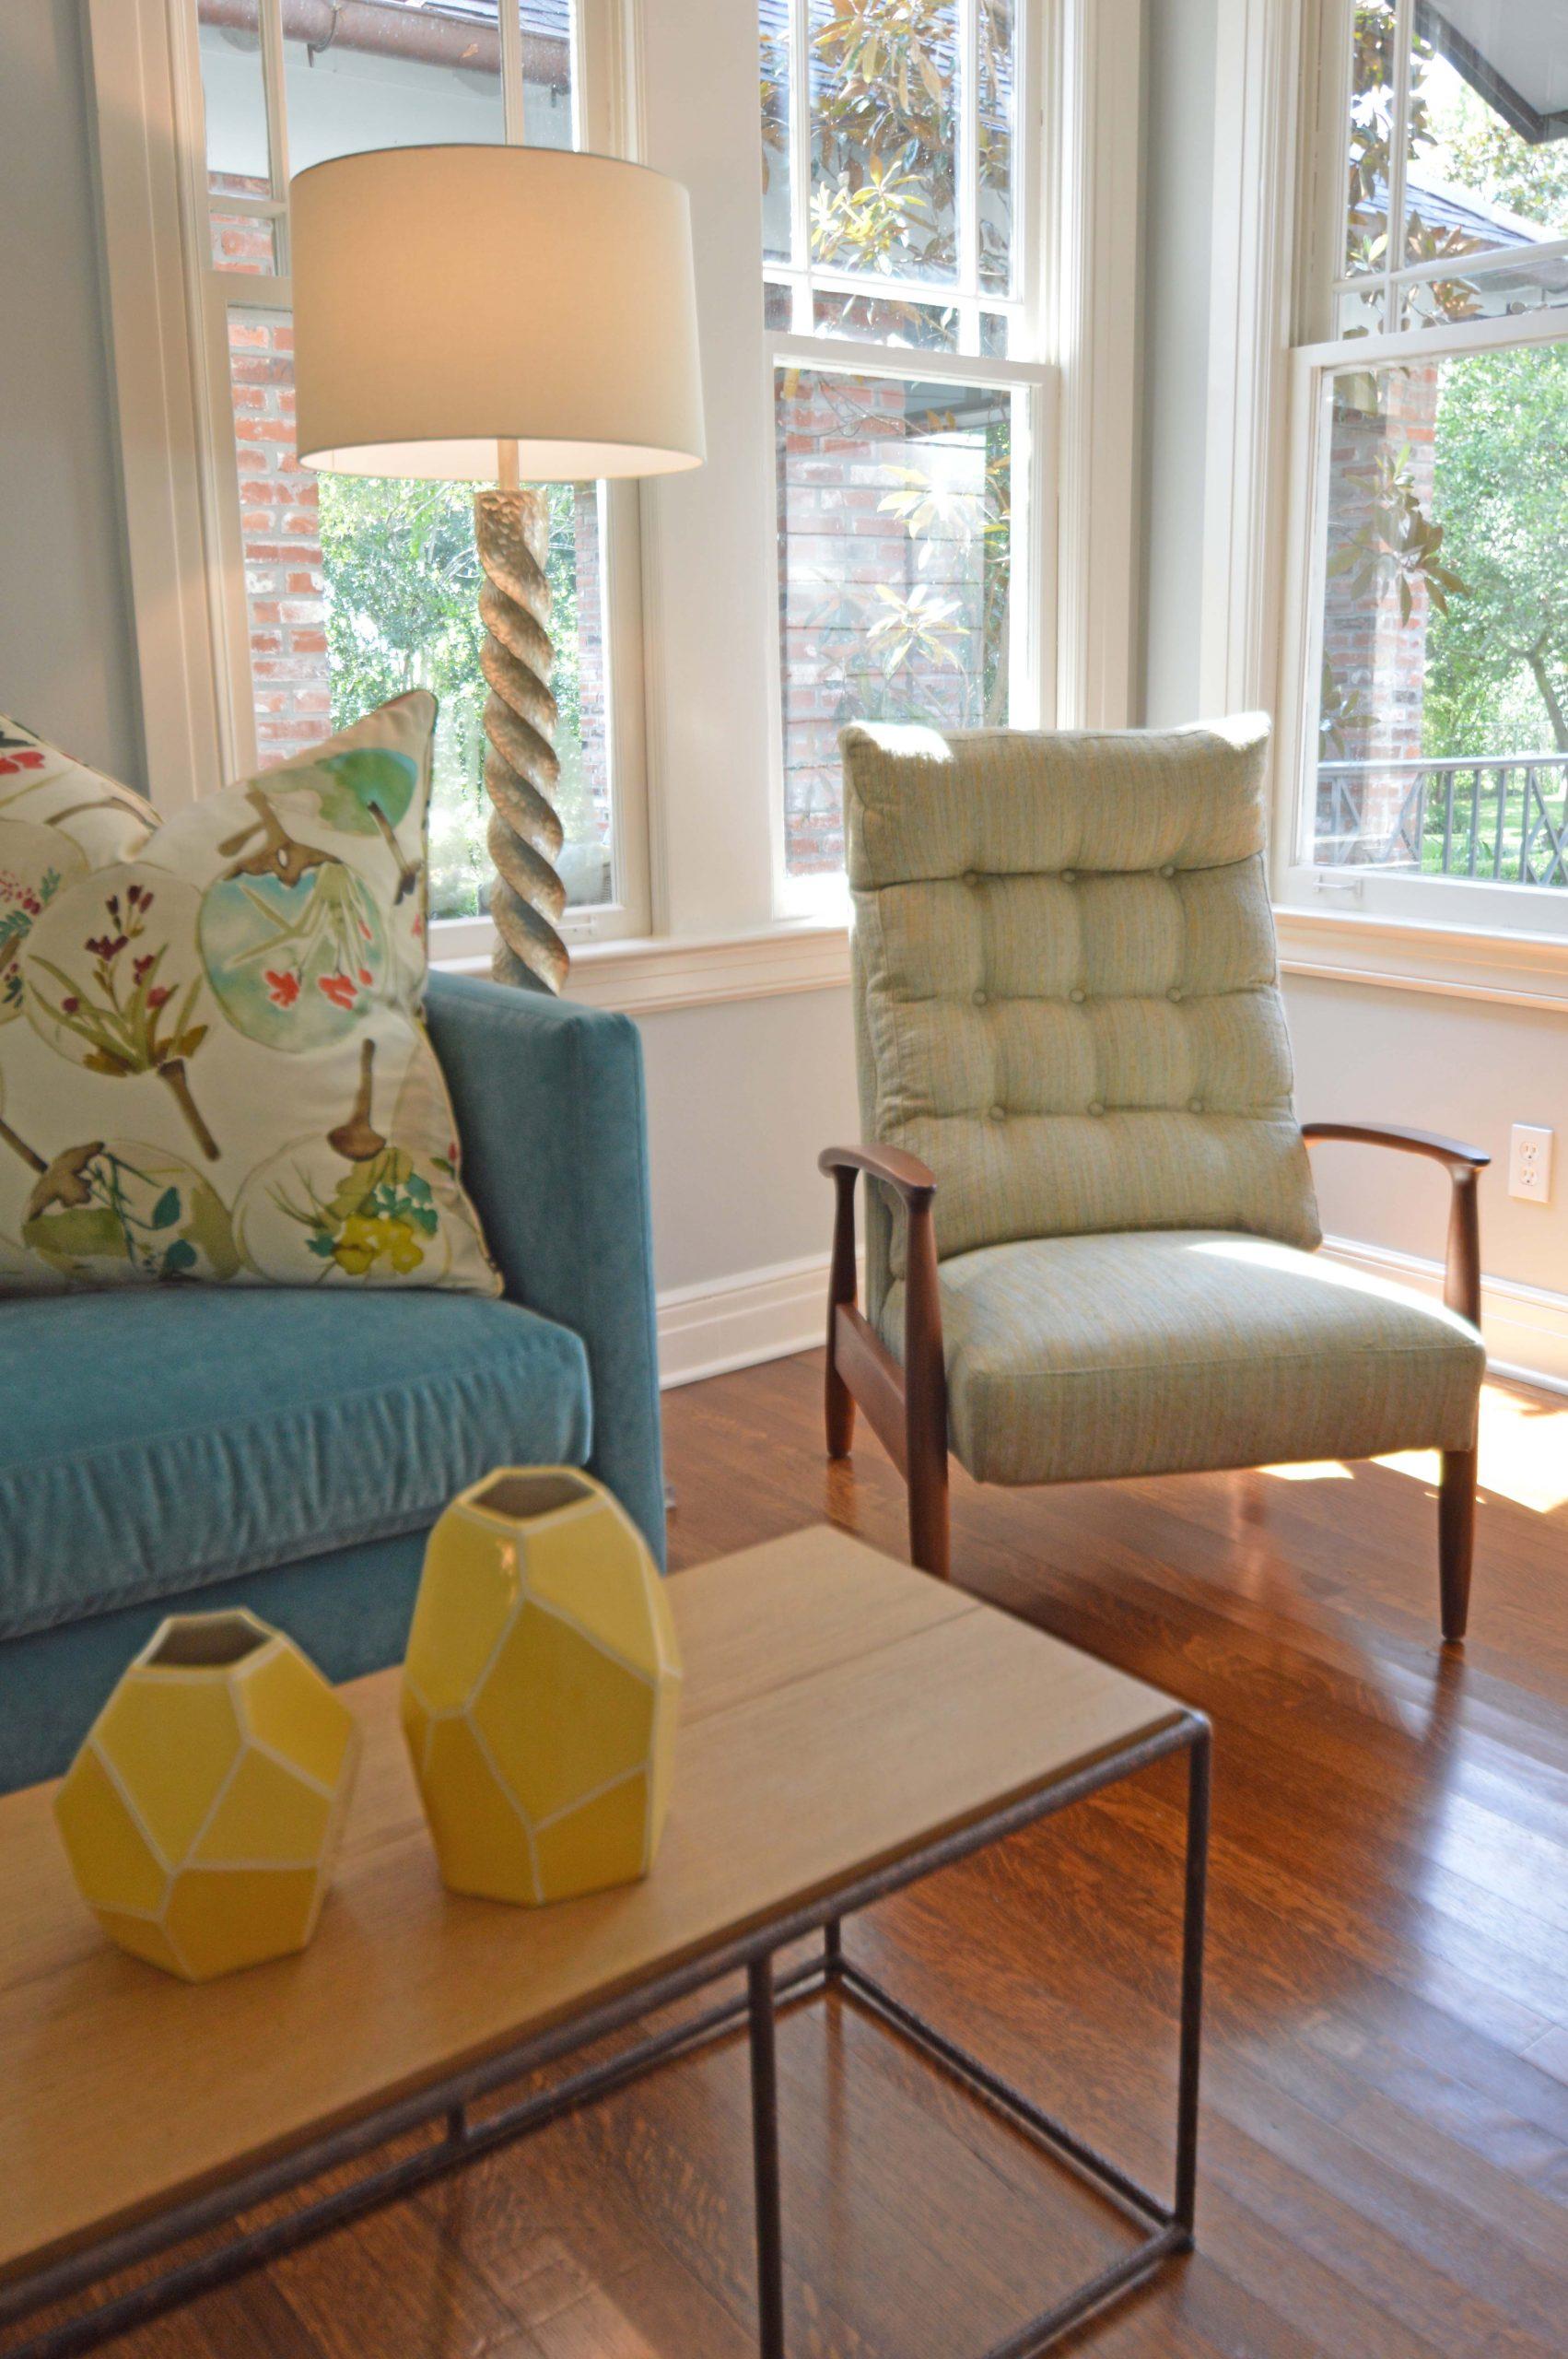 maranto-david-dixon-smith-interiors-baton-rouge-interior-design-custom-furniture-web-0002